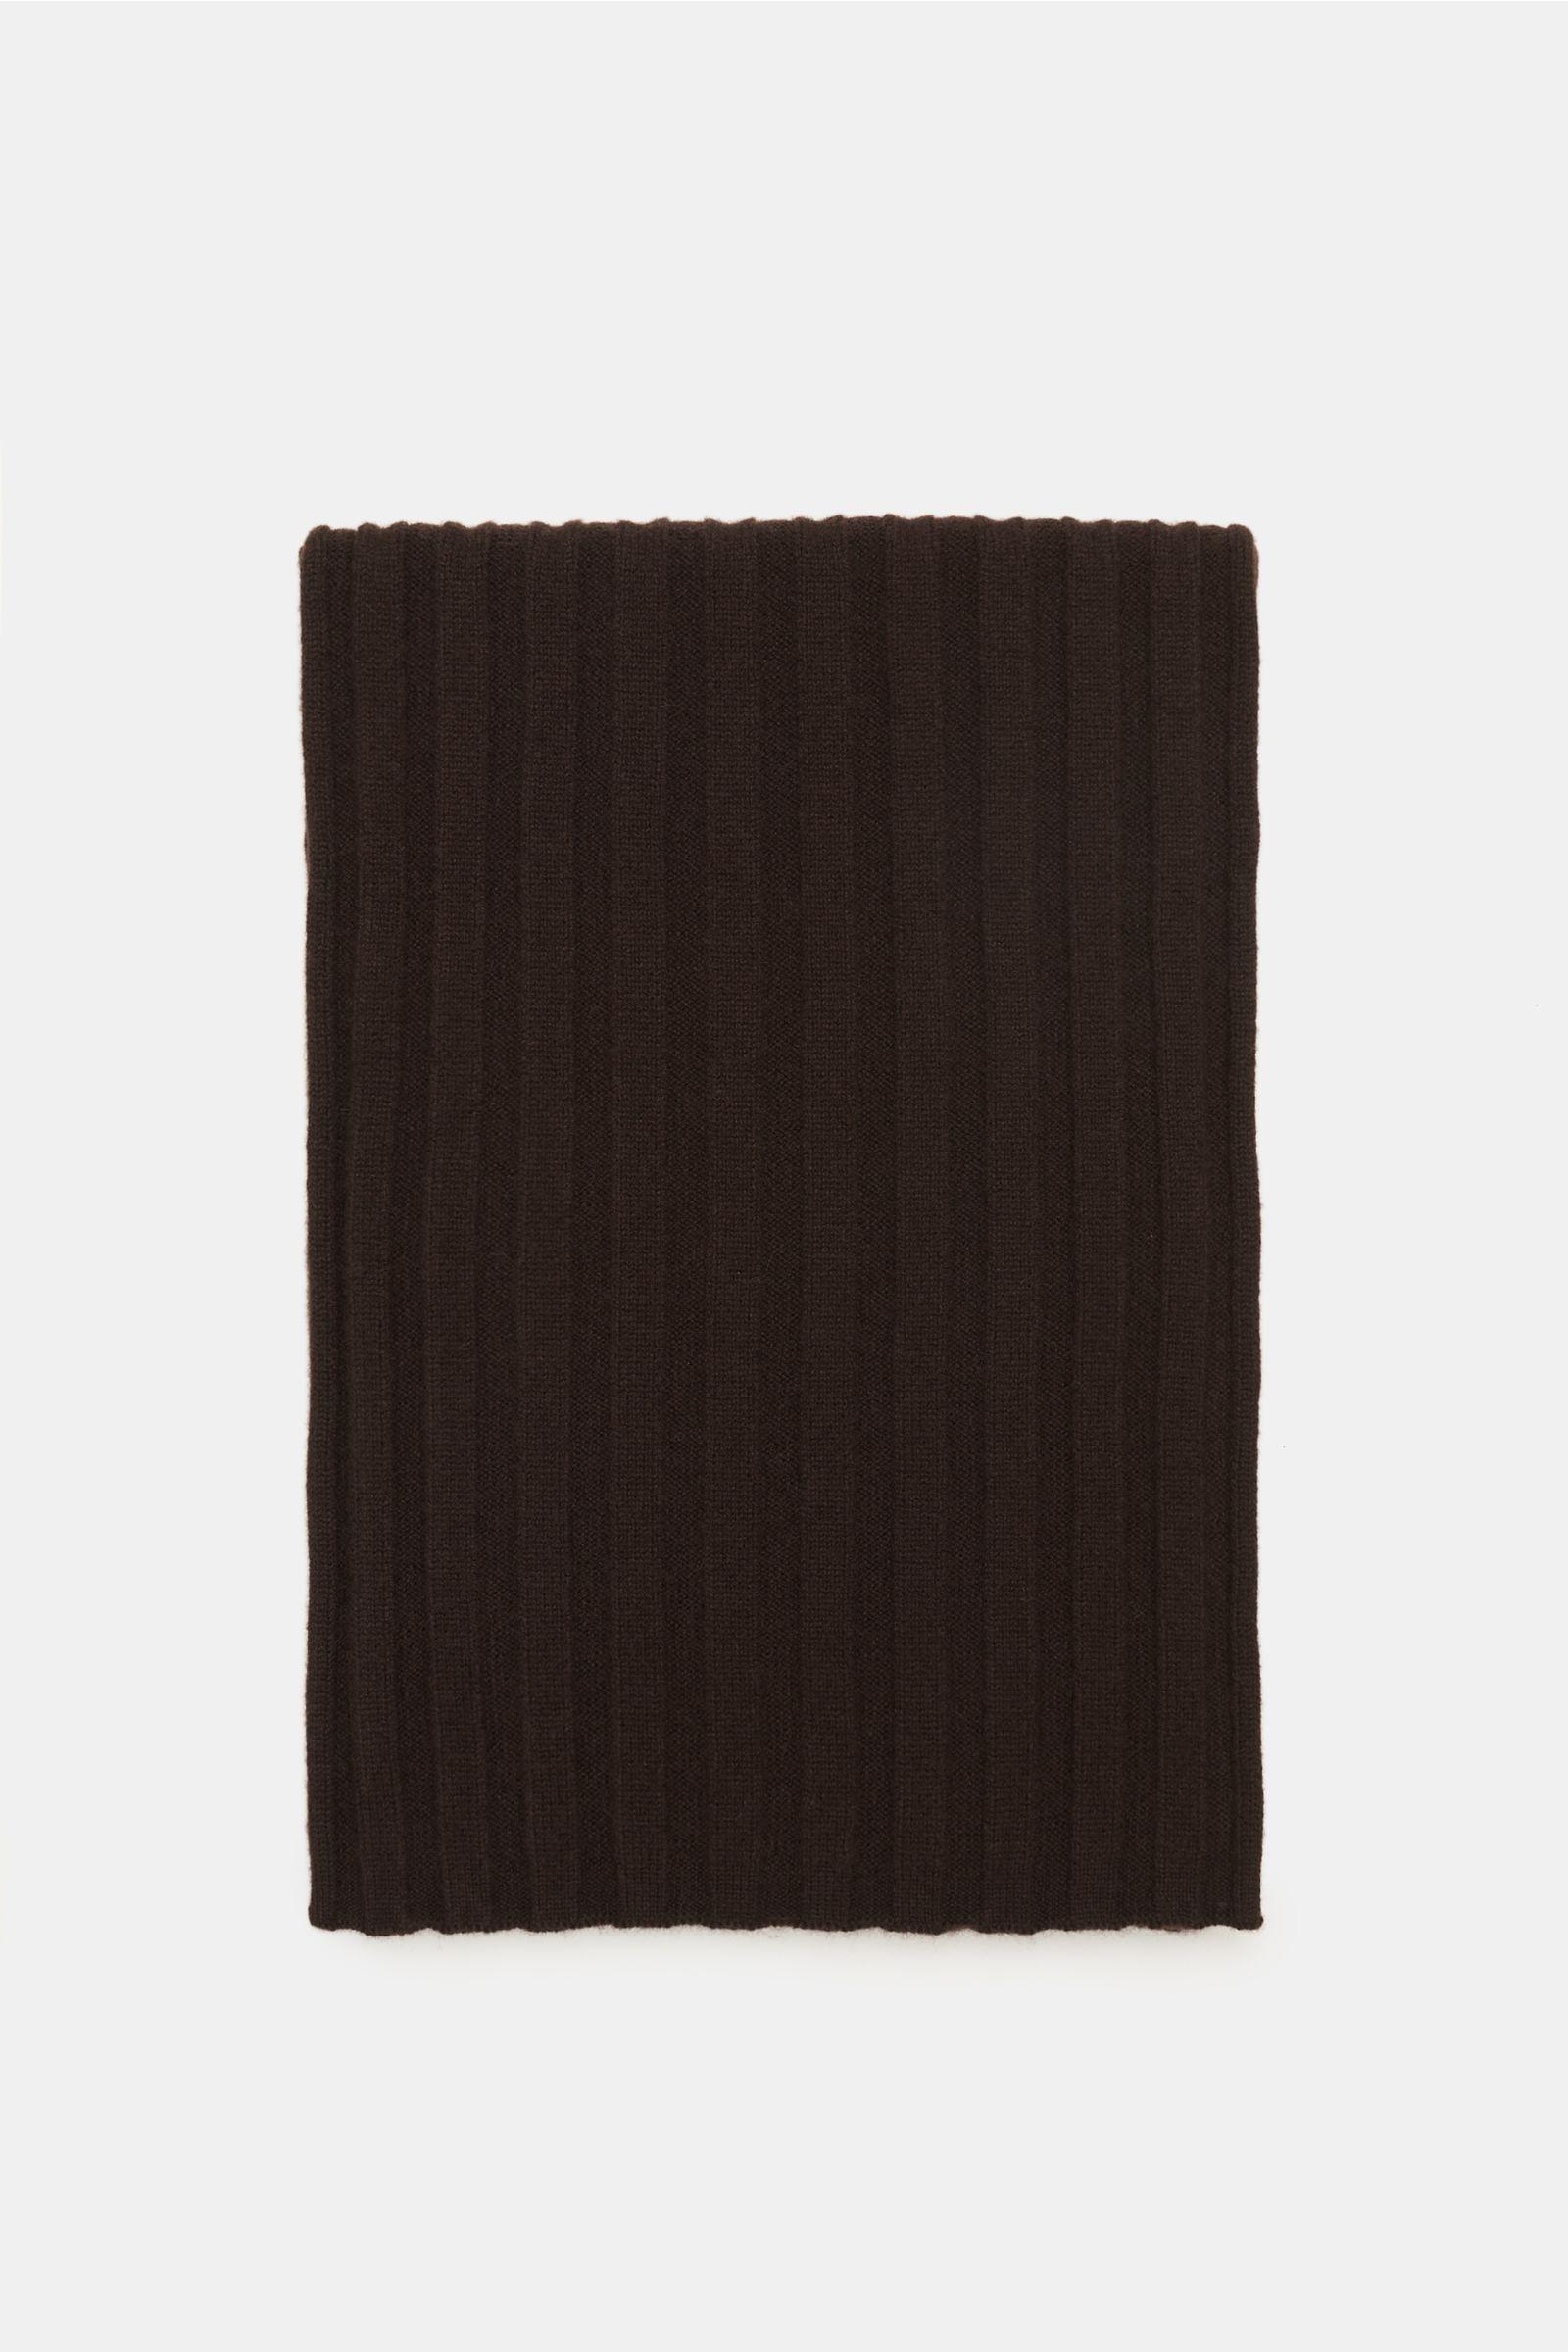 Cashmere Schal dunkelbraun